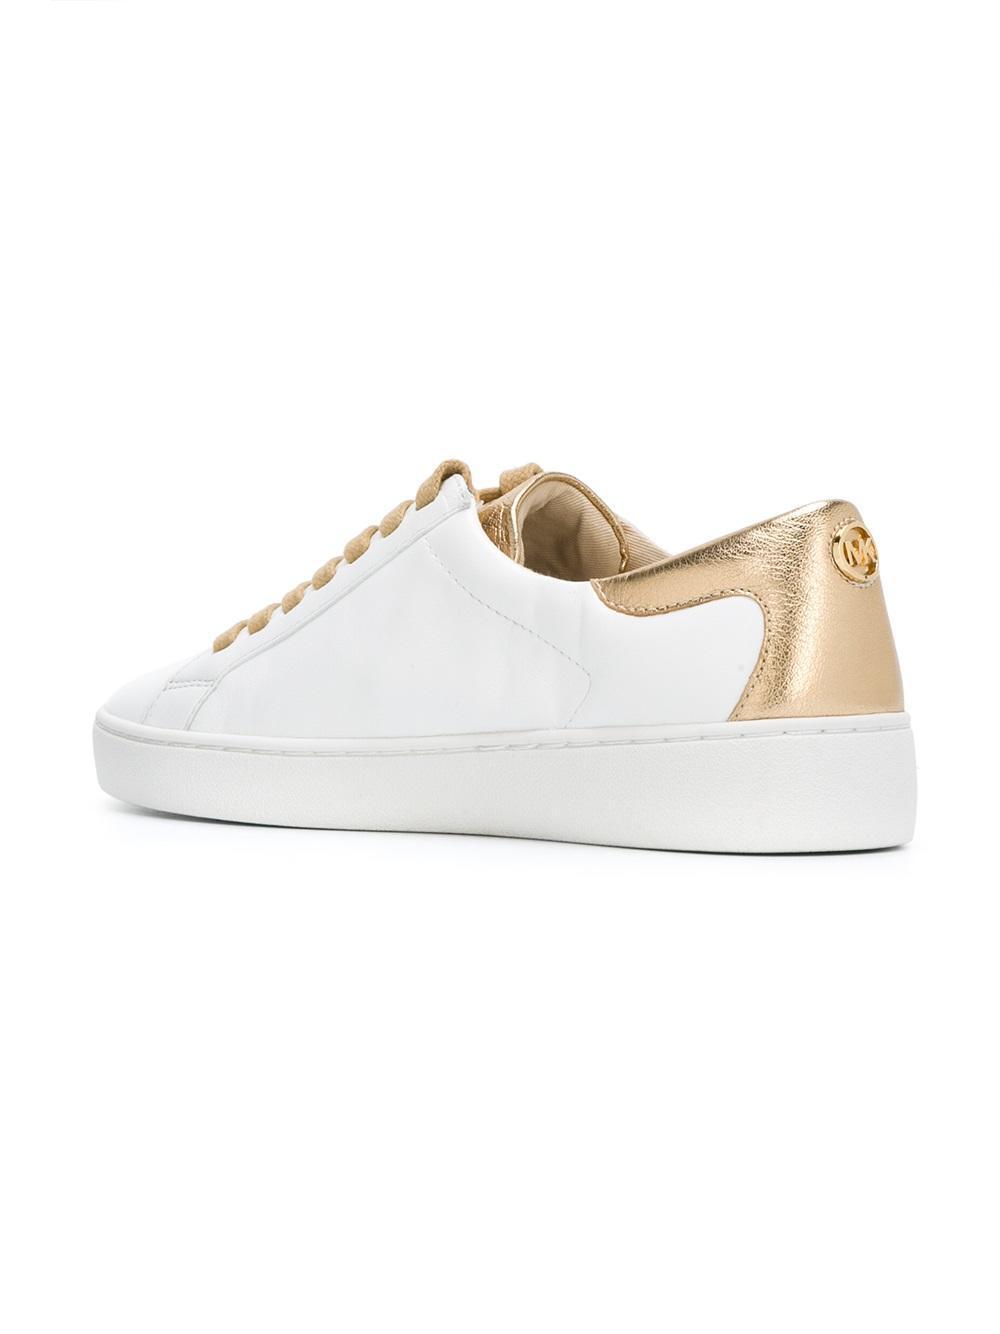 91d563053626 Lyst - MICHAEL Michael Kors Gold Flowers Lola Sneakers in Metallic